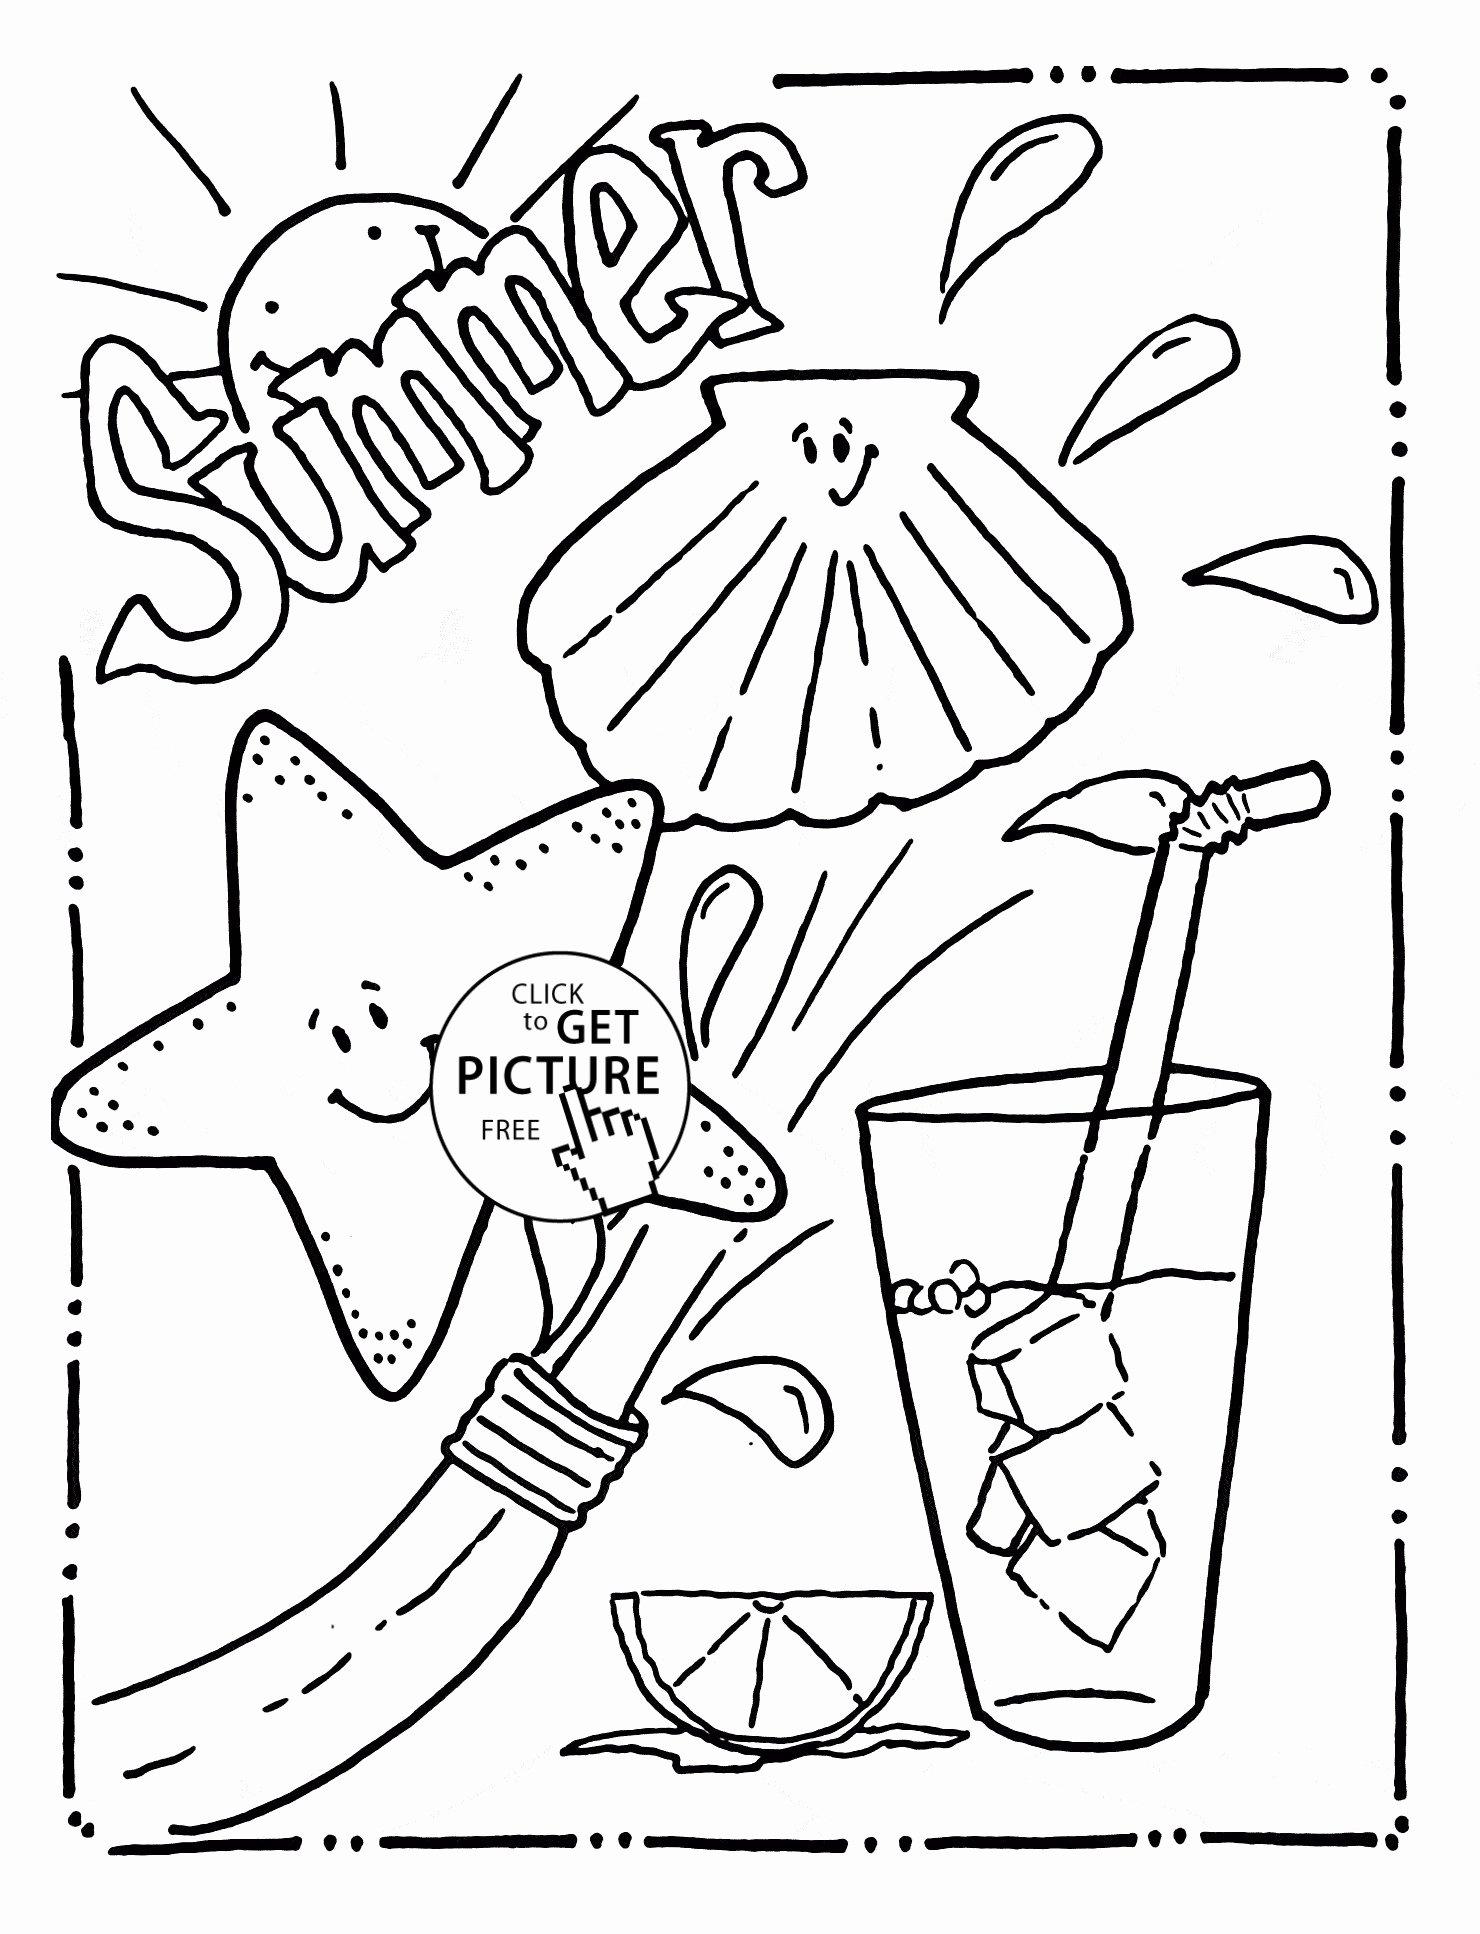 Beach Worksheets for Preschoolers top Coloring Funng Worksheets for Kindergarten Beach Kids